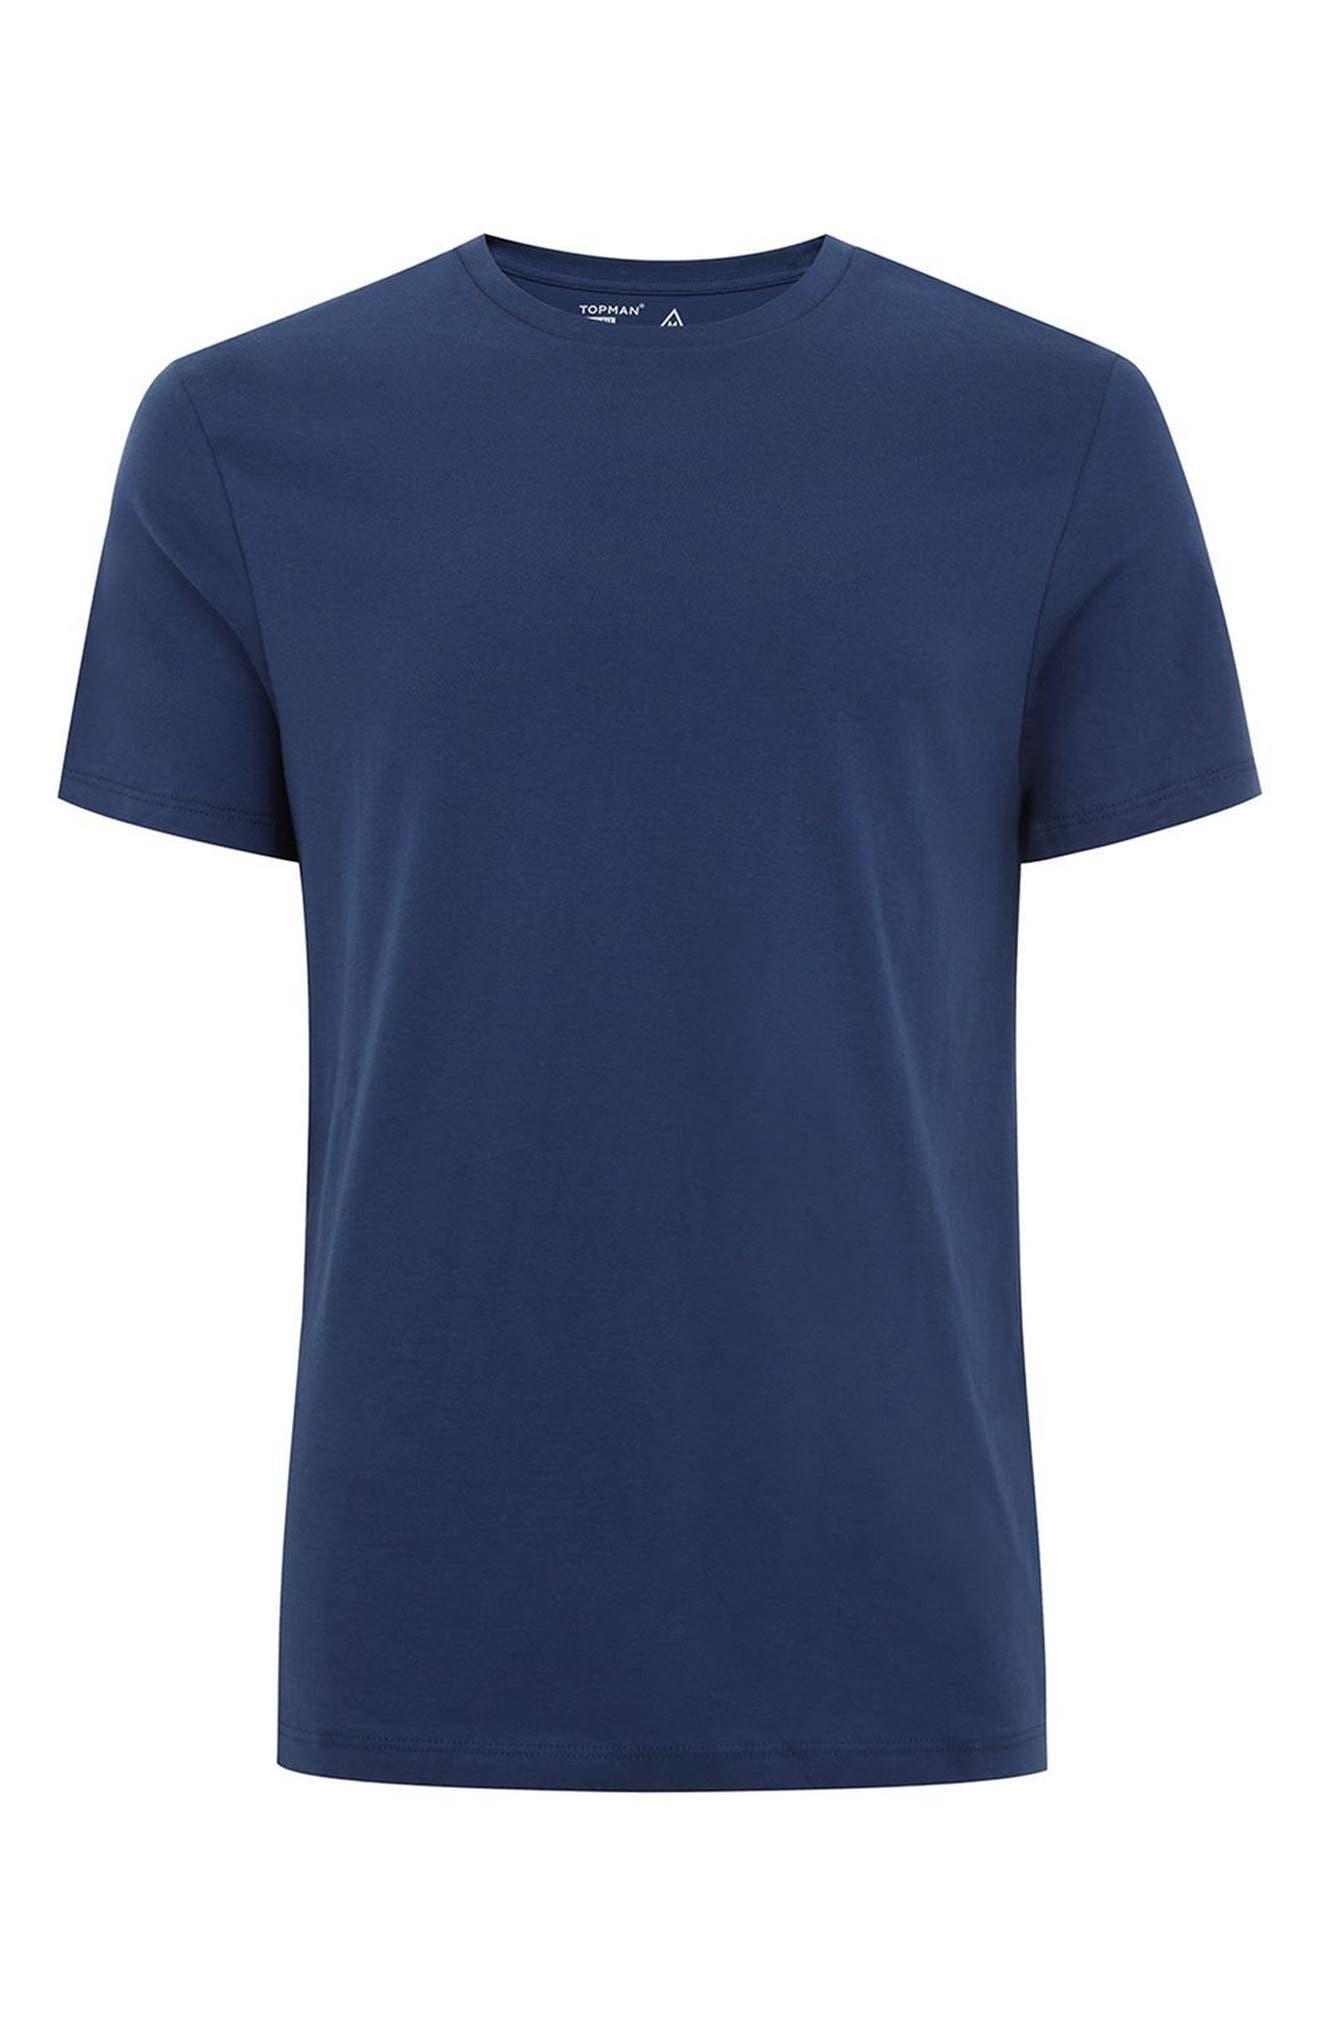 TOPMAN,                             Slim Fit Crewneck T-Shirt,                             Alternate thumbnail 4, color,                             450